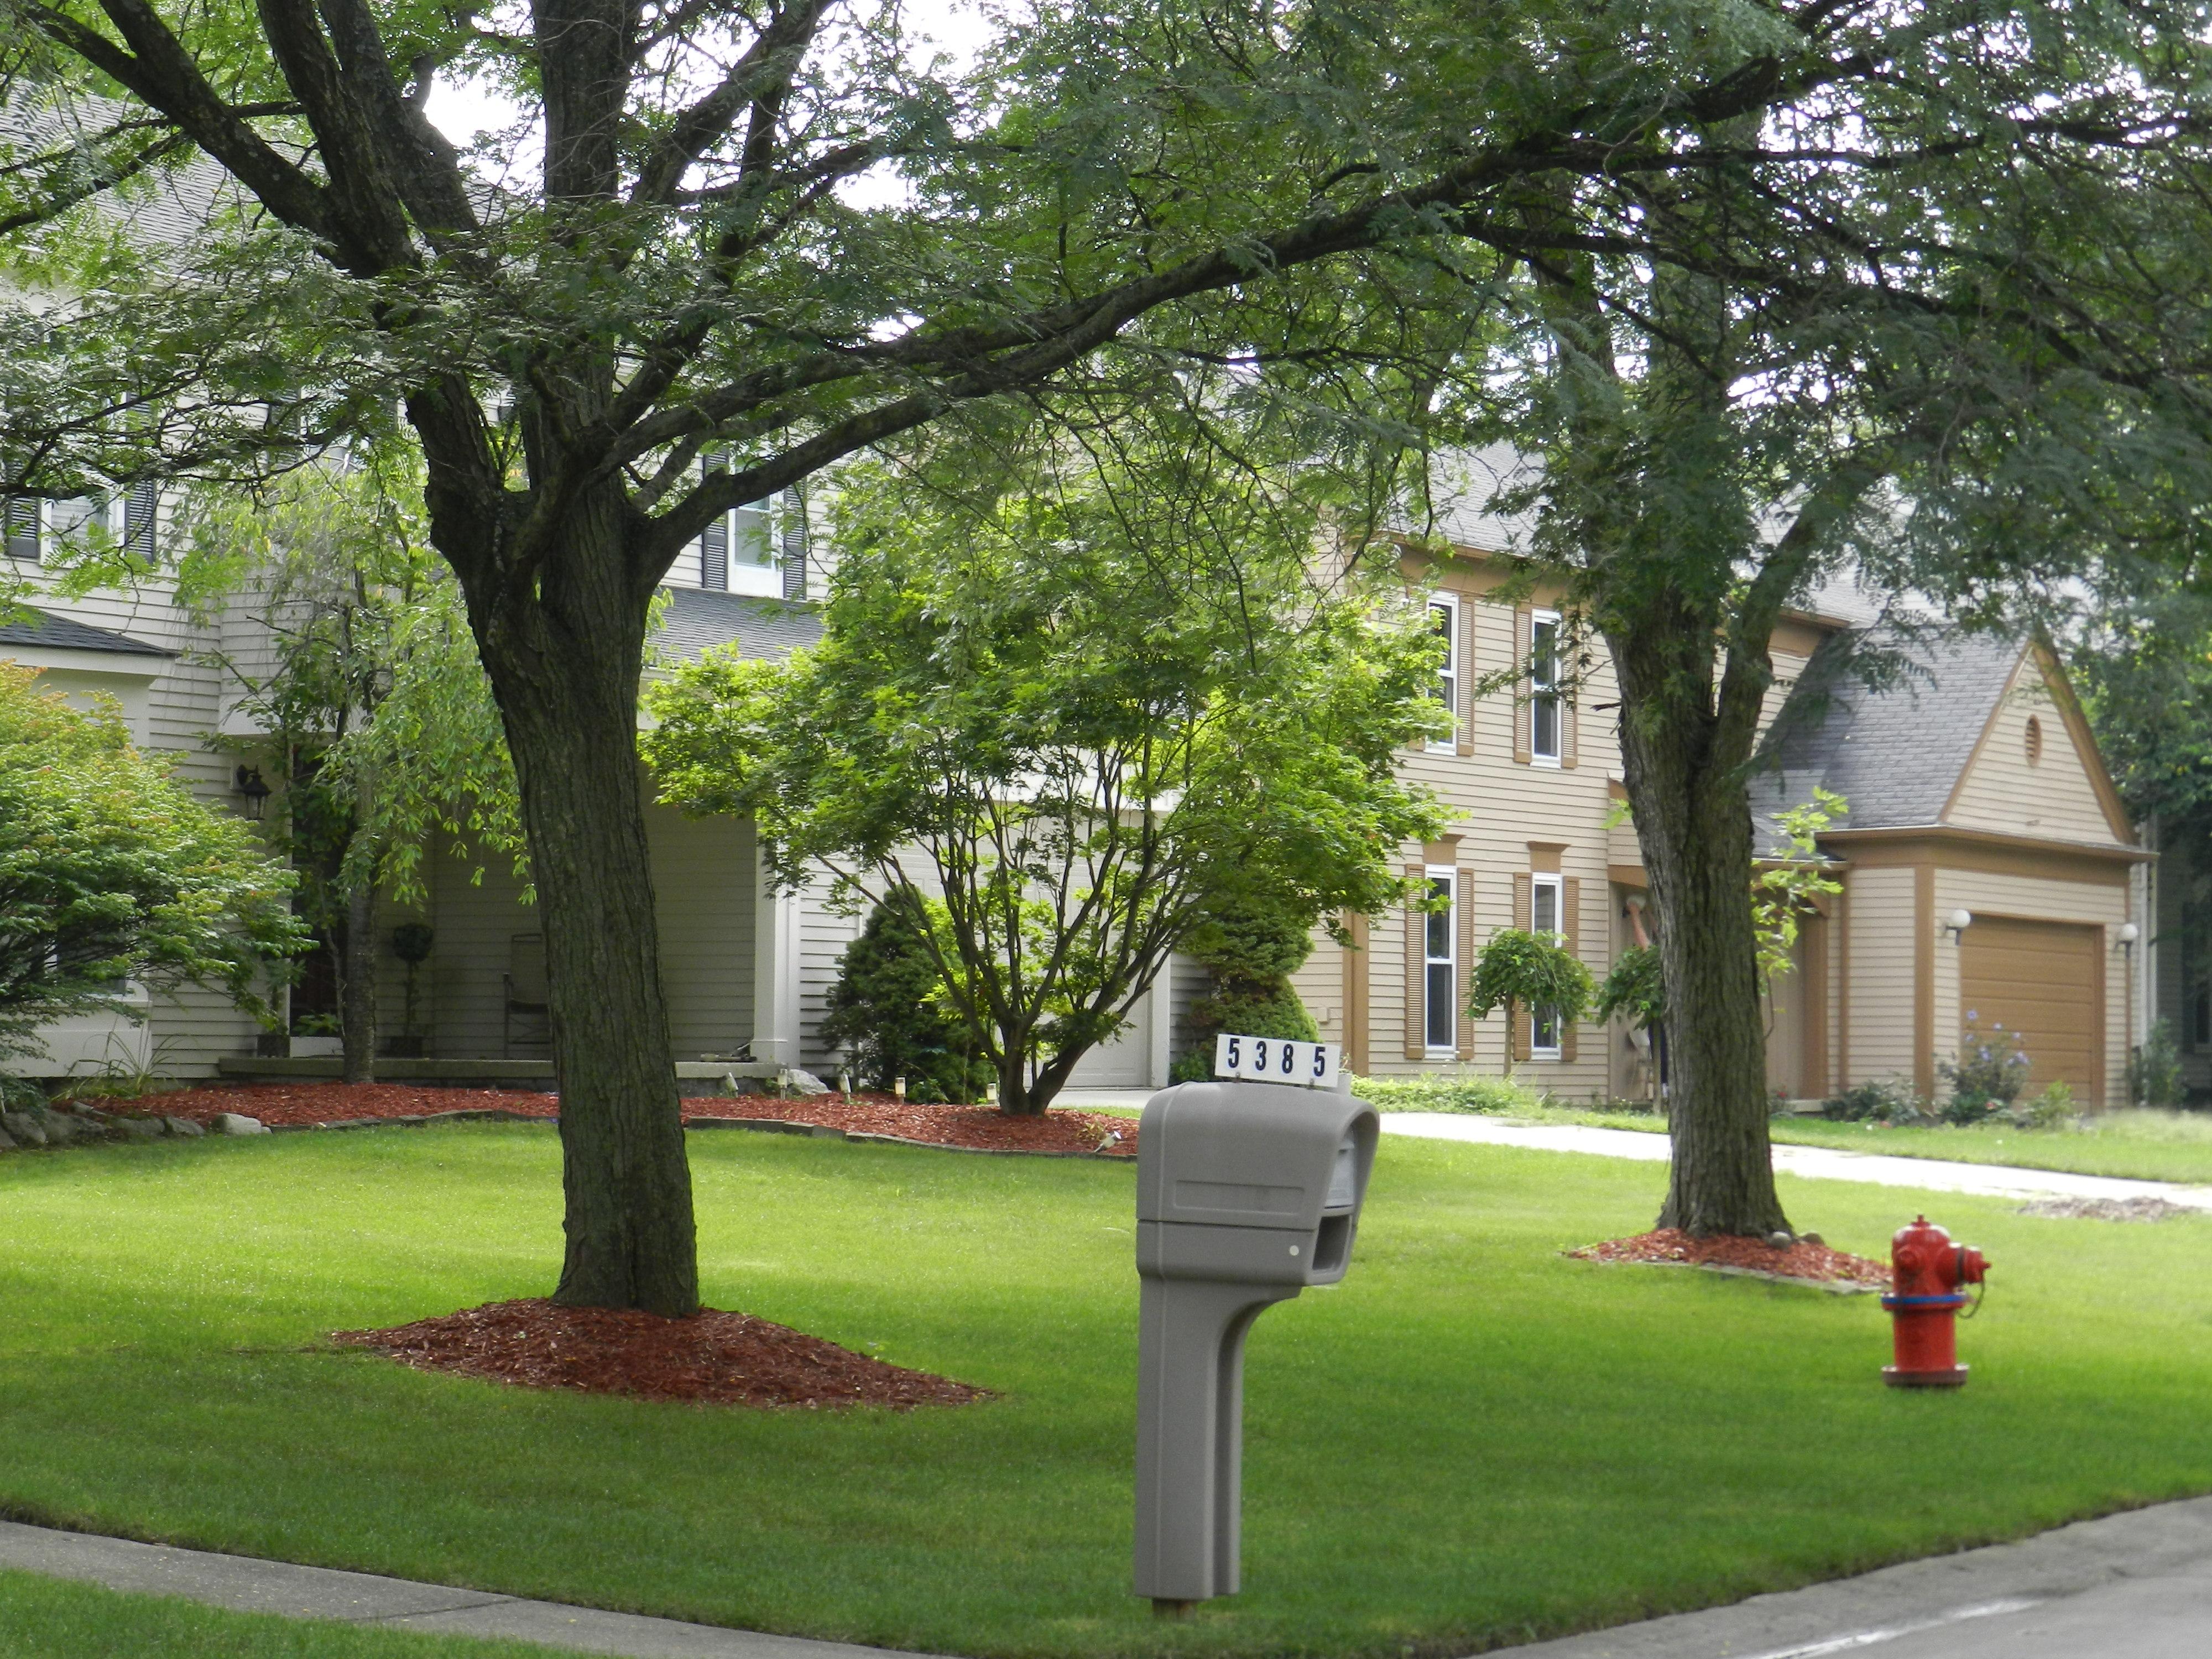 Fox Run Green Neighborhood - West Bloomfield, Michigan